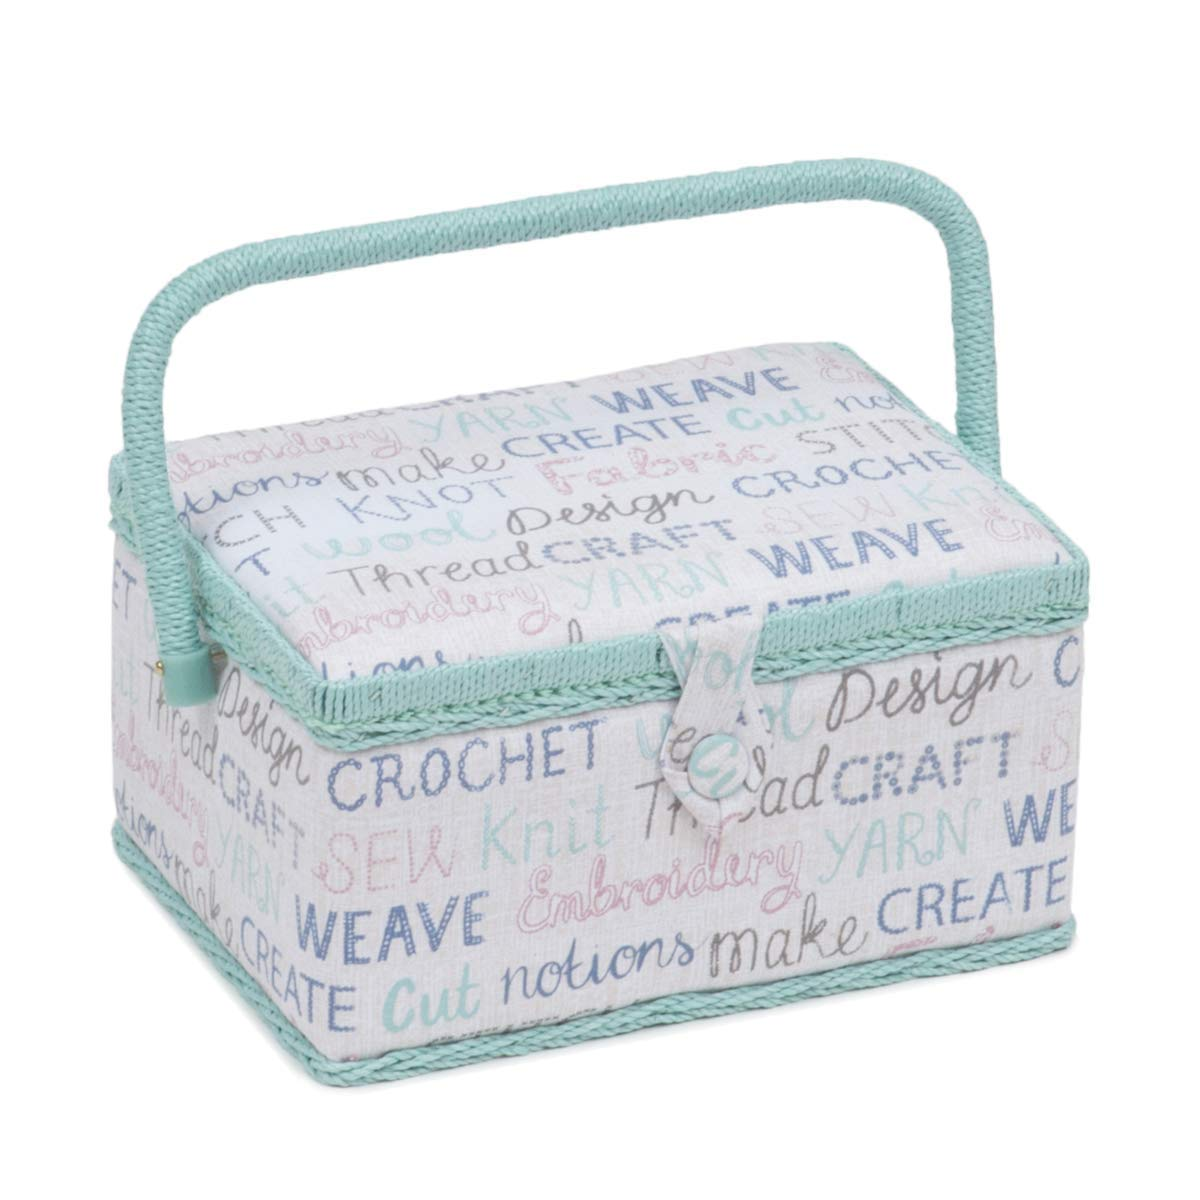 Haby Words HobbyGift MRM\439 Medium Sewing Box // Organiser 19x26x14.5cm